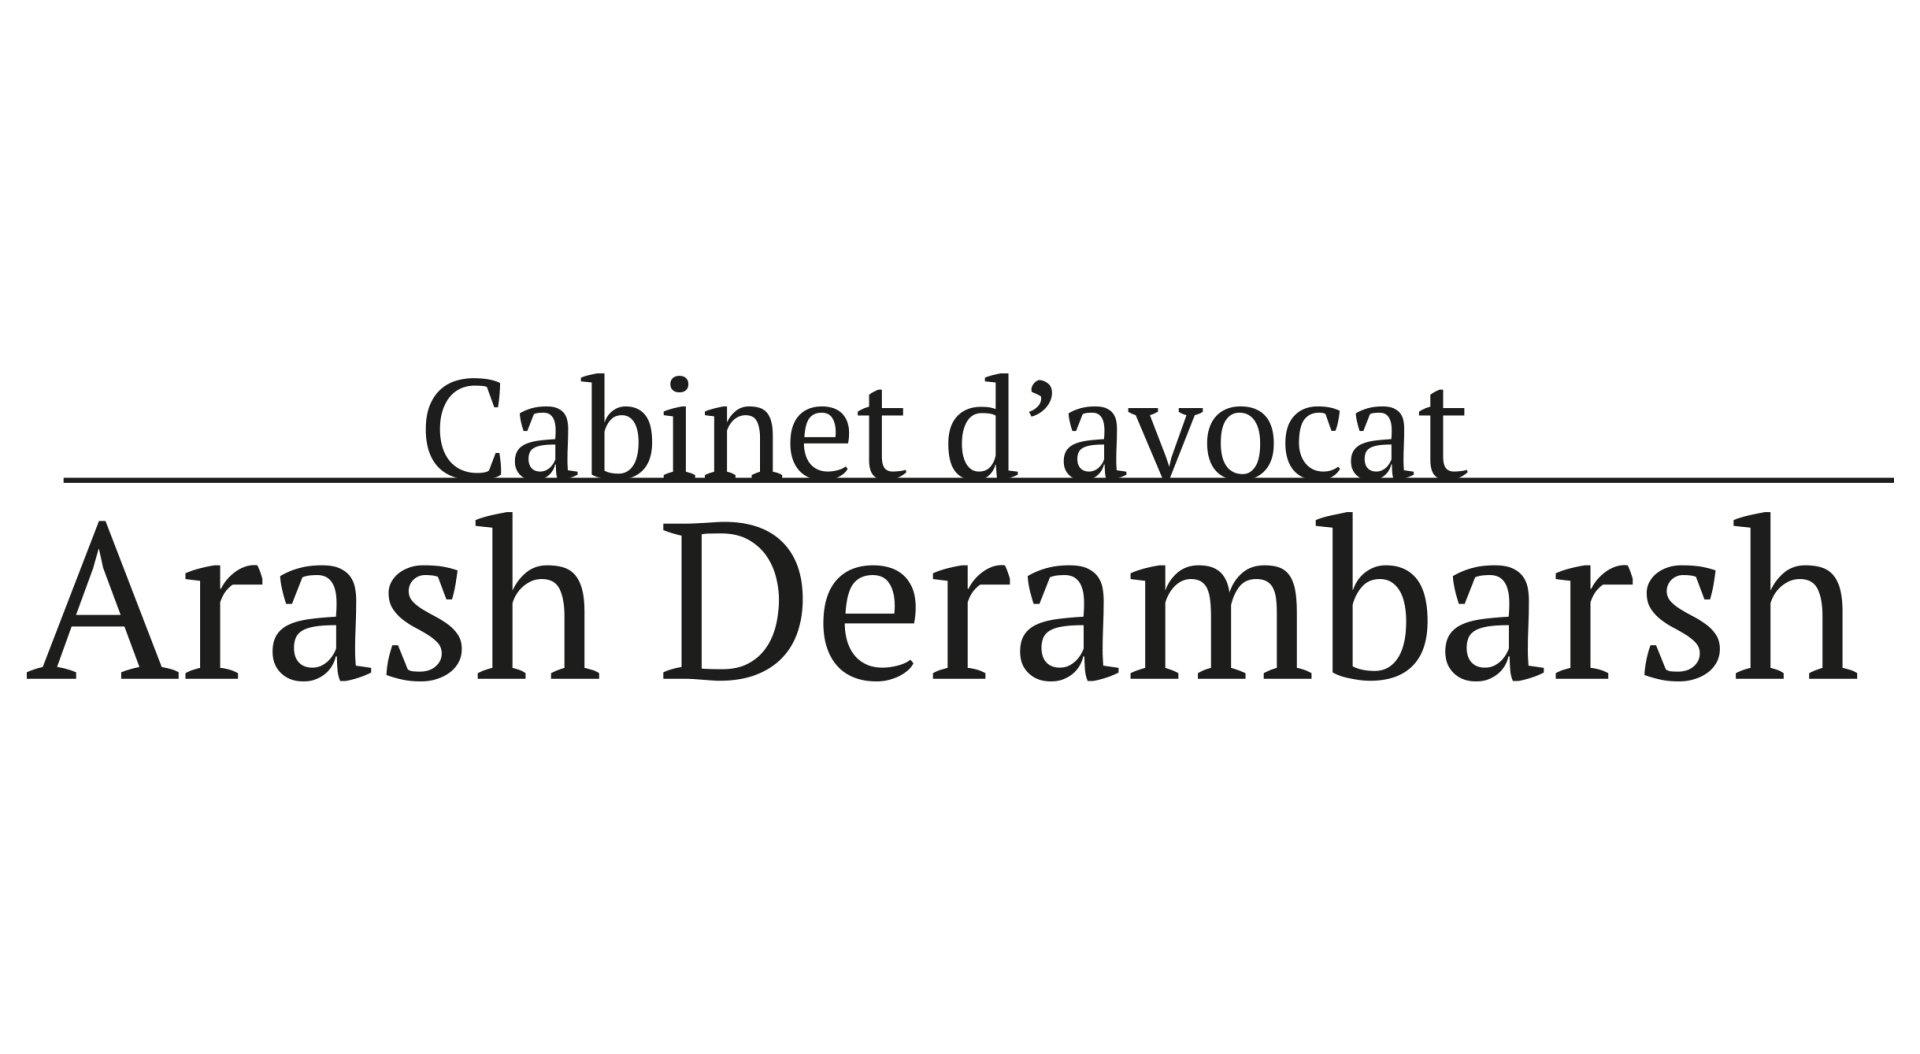 Arash Derambarsh Avocat